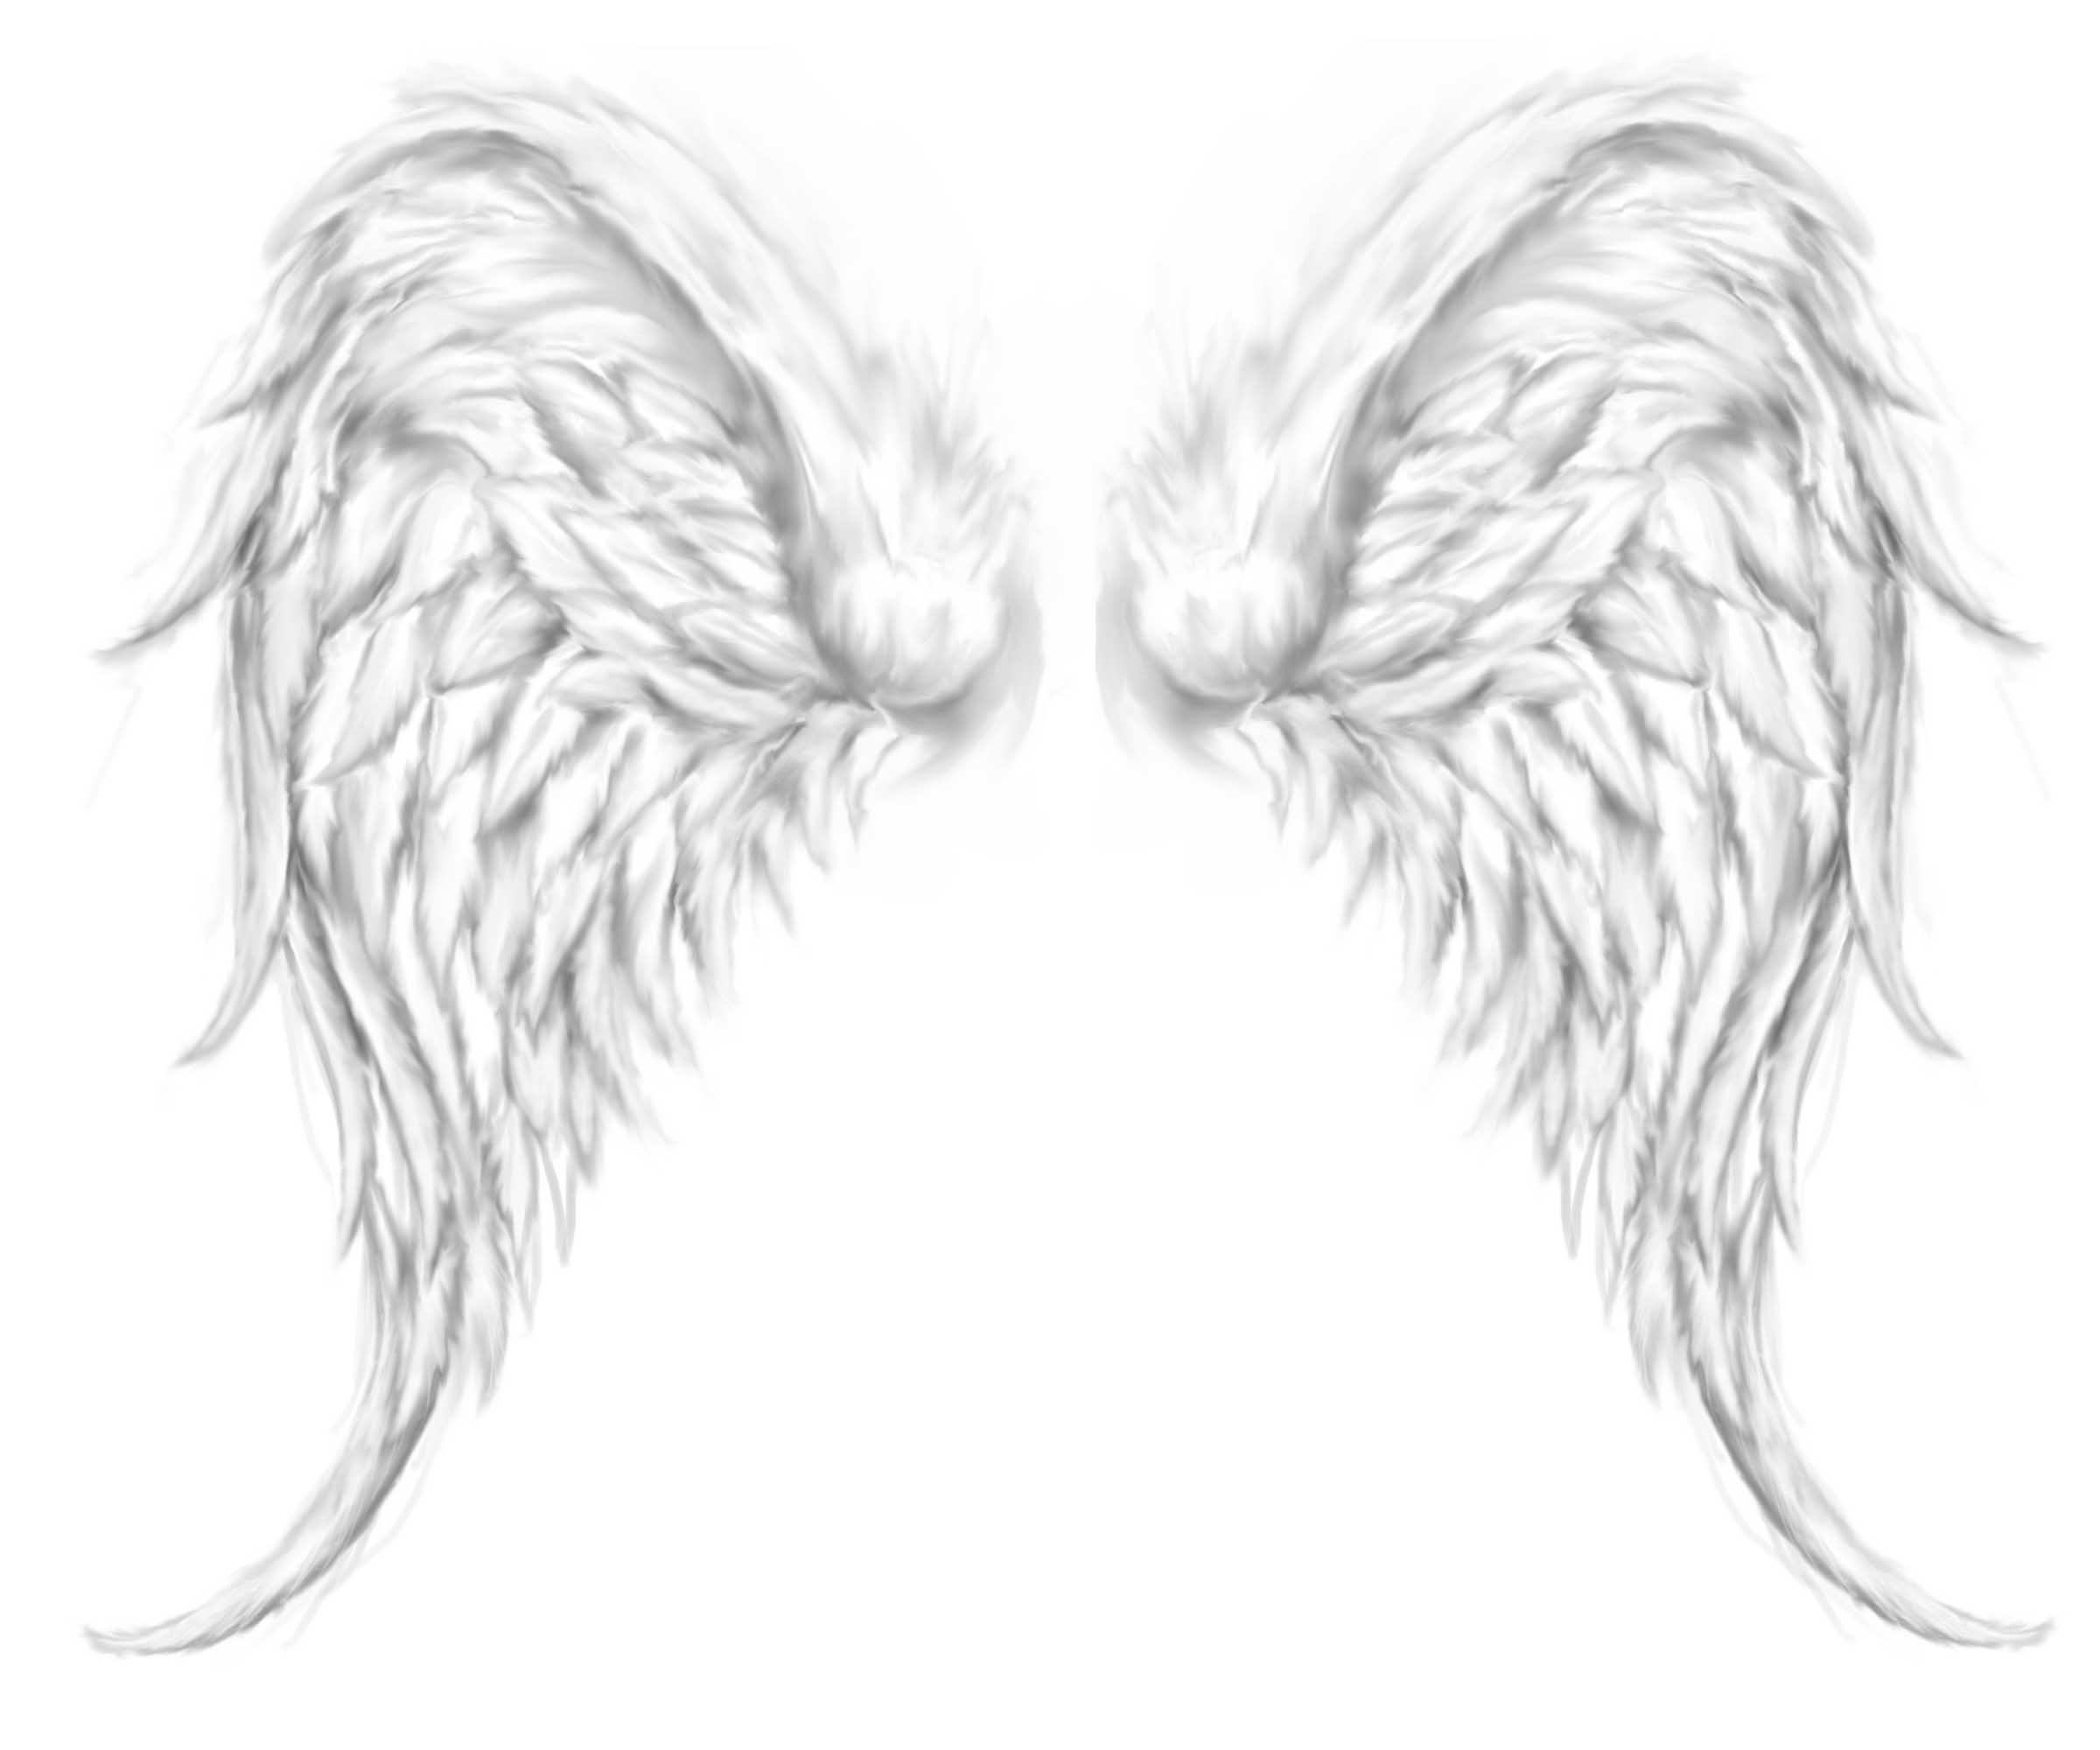 Grey Ink Angel Wings Tattoo Design